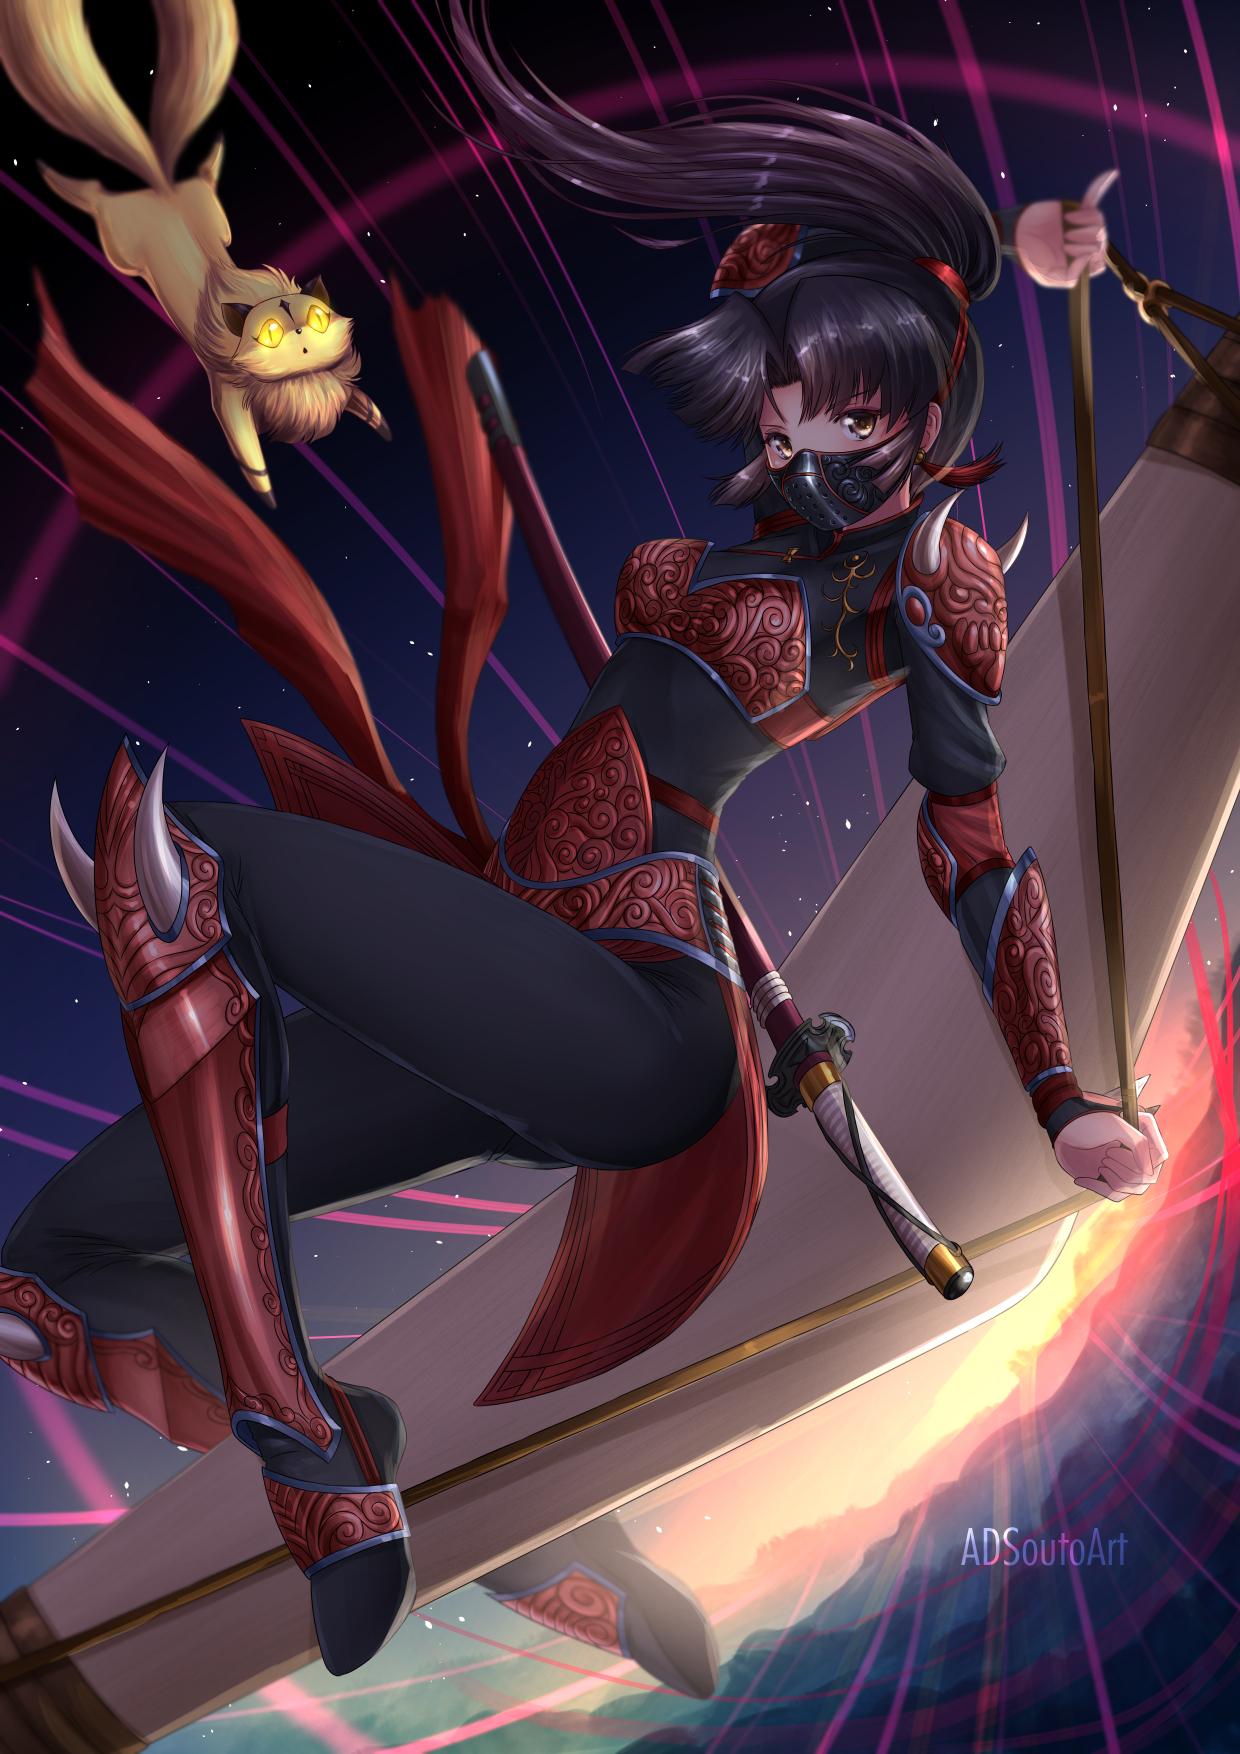 Sango, The Demon Slayer